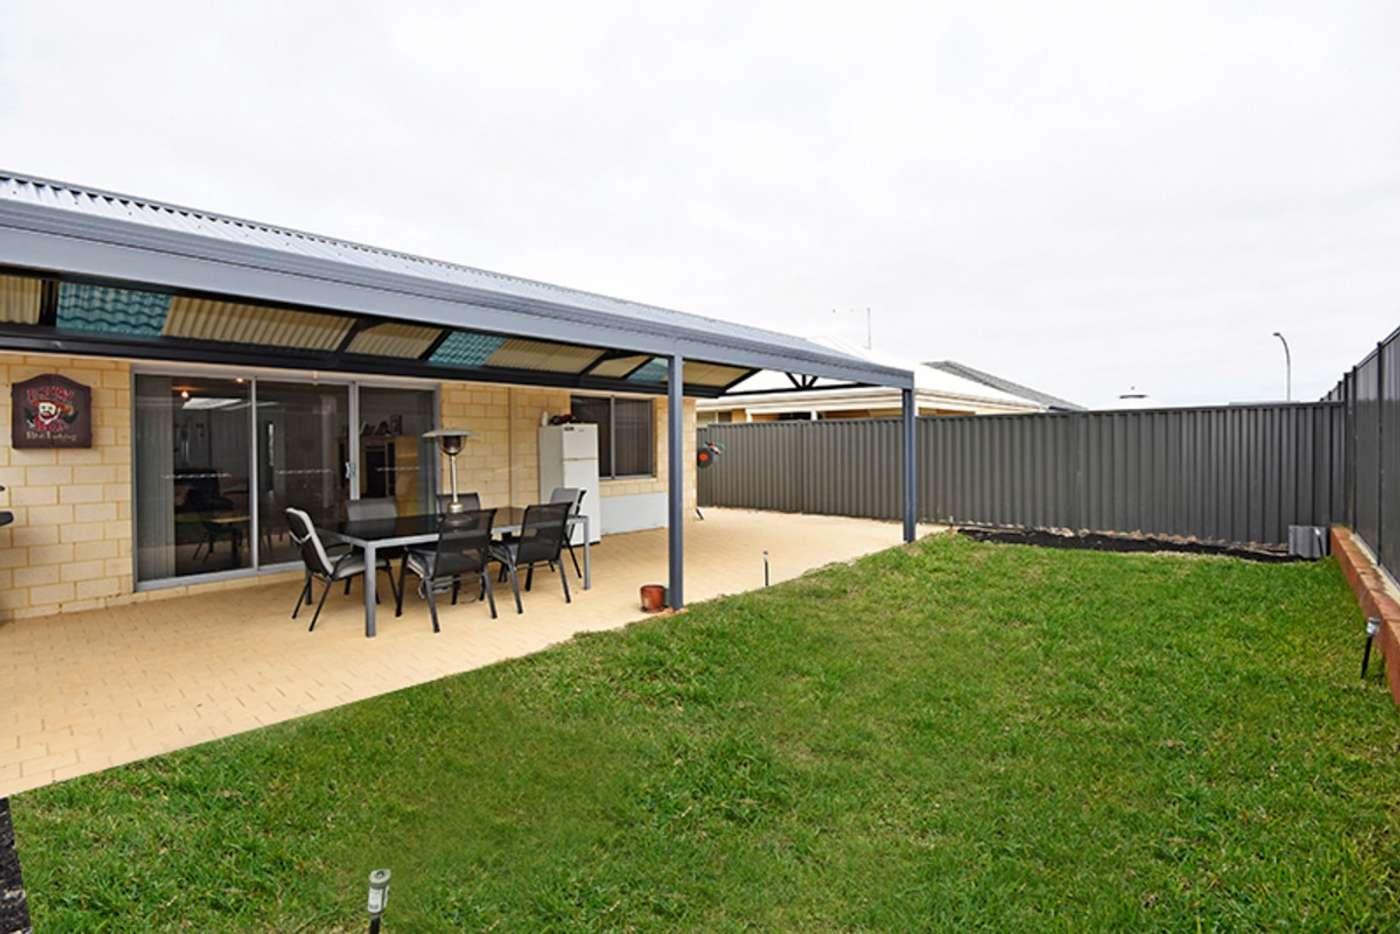 Main view of Homely house listing, 8 Topsham Way, Caversham WA 6055